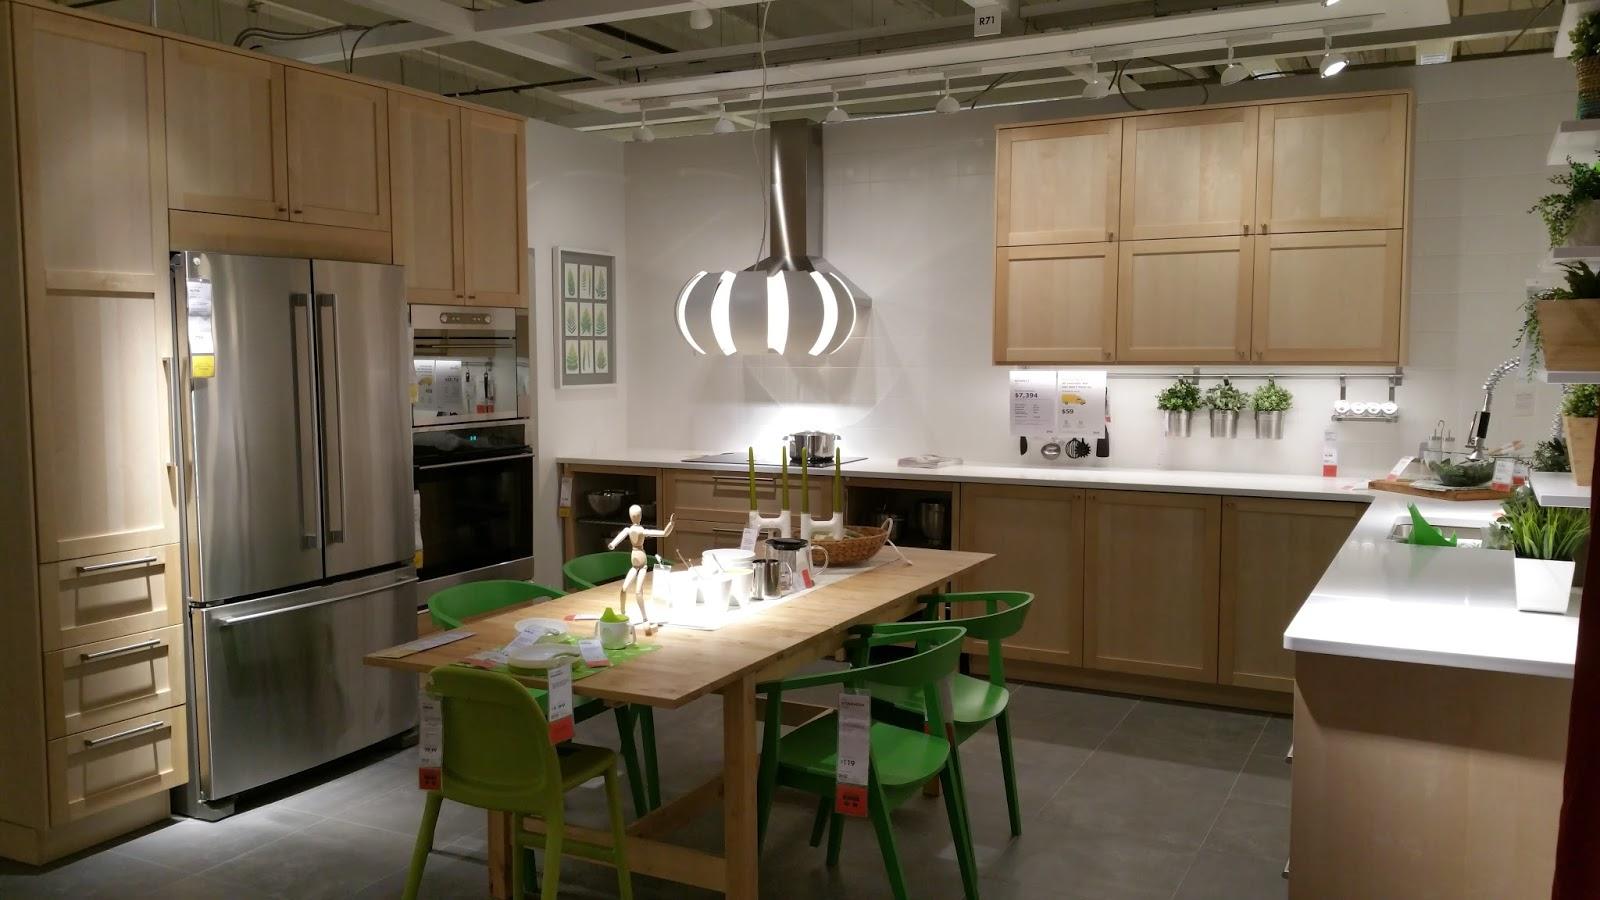 Ikea Grimslov Kitchen Cabinets Vs Rta